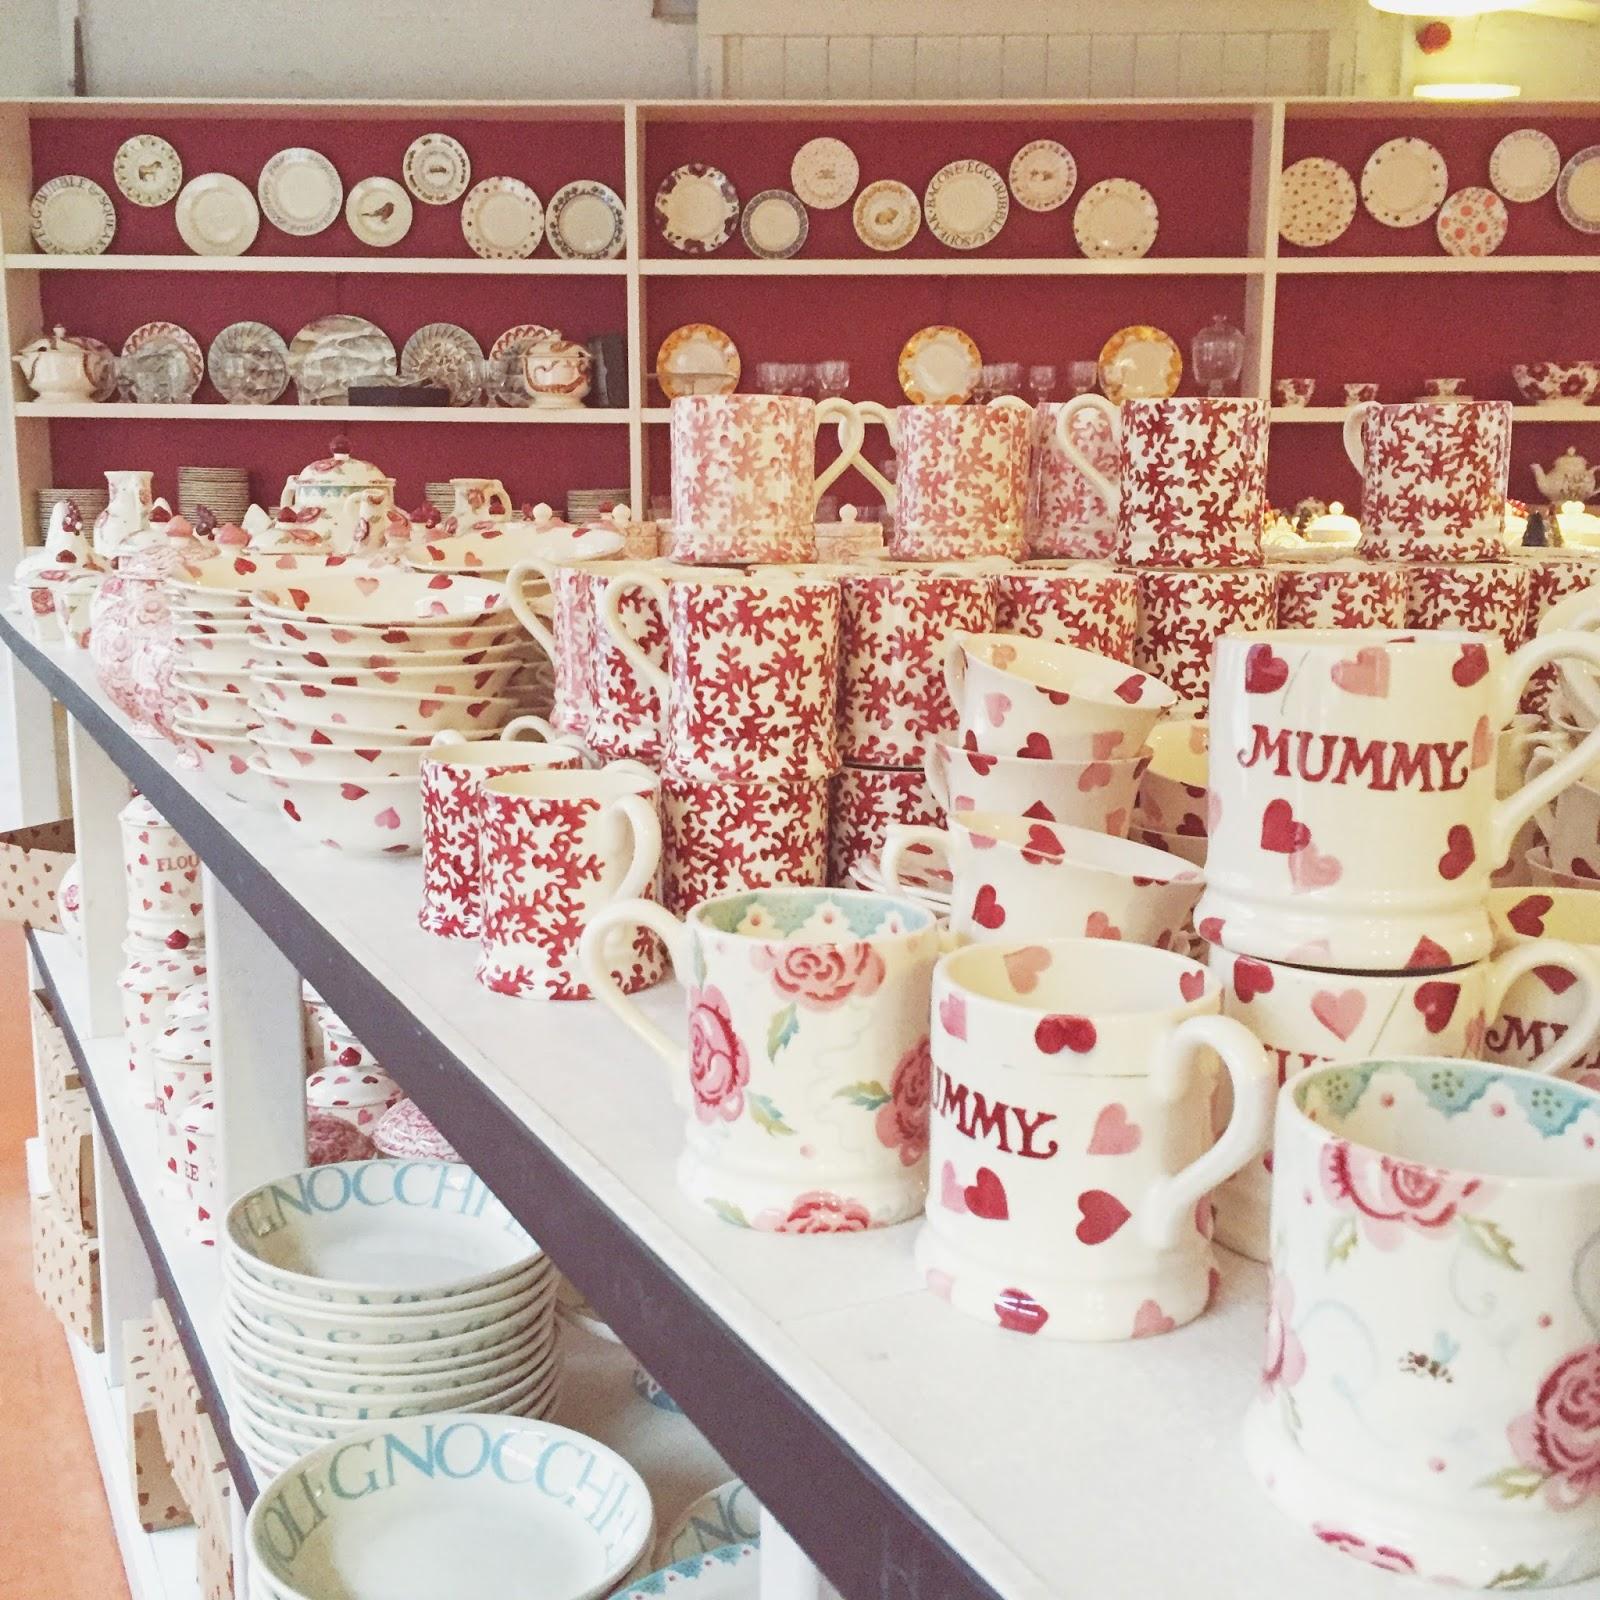 Emma Bridgewater Factory Shop, Emma Bridgewater Factory, Stoke-On-Trent, Staffordshire, katiebwrites, katiewrites, Mugs, Decorating Studio,